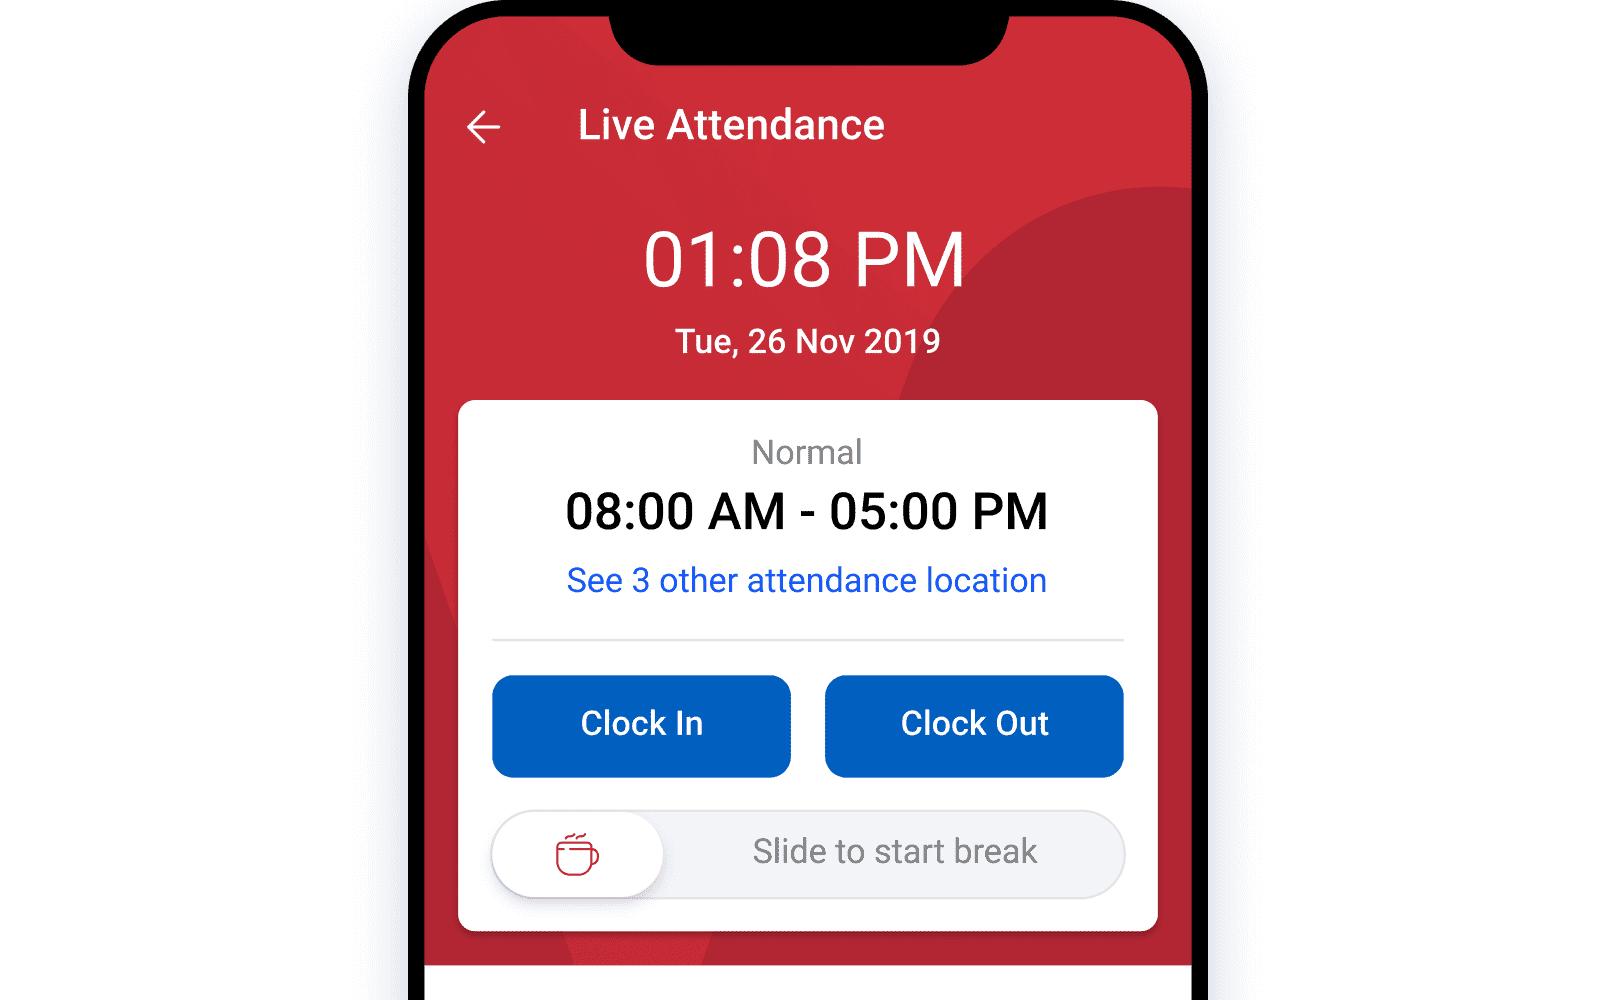 GPS-based Attendance